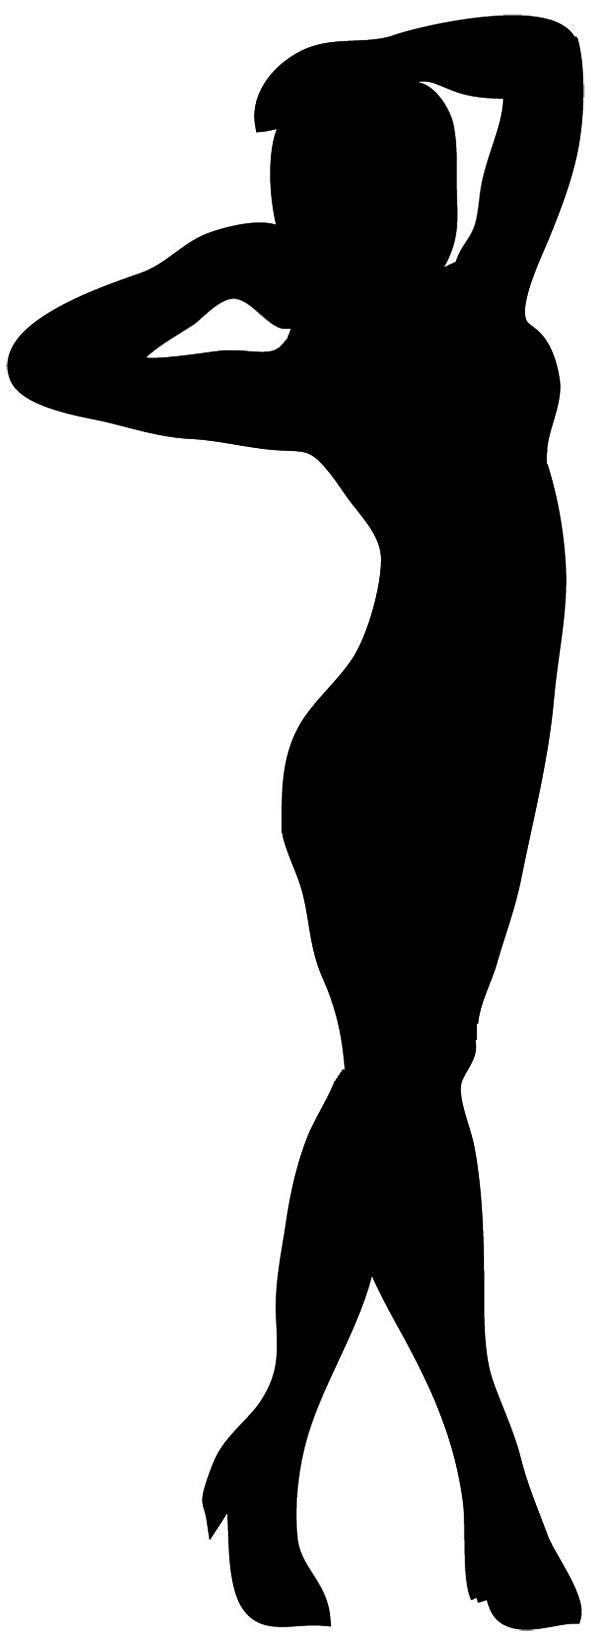 female silhouette standing woman black .-female silhouette standing woman black ...-3